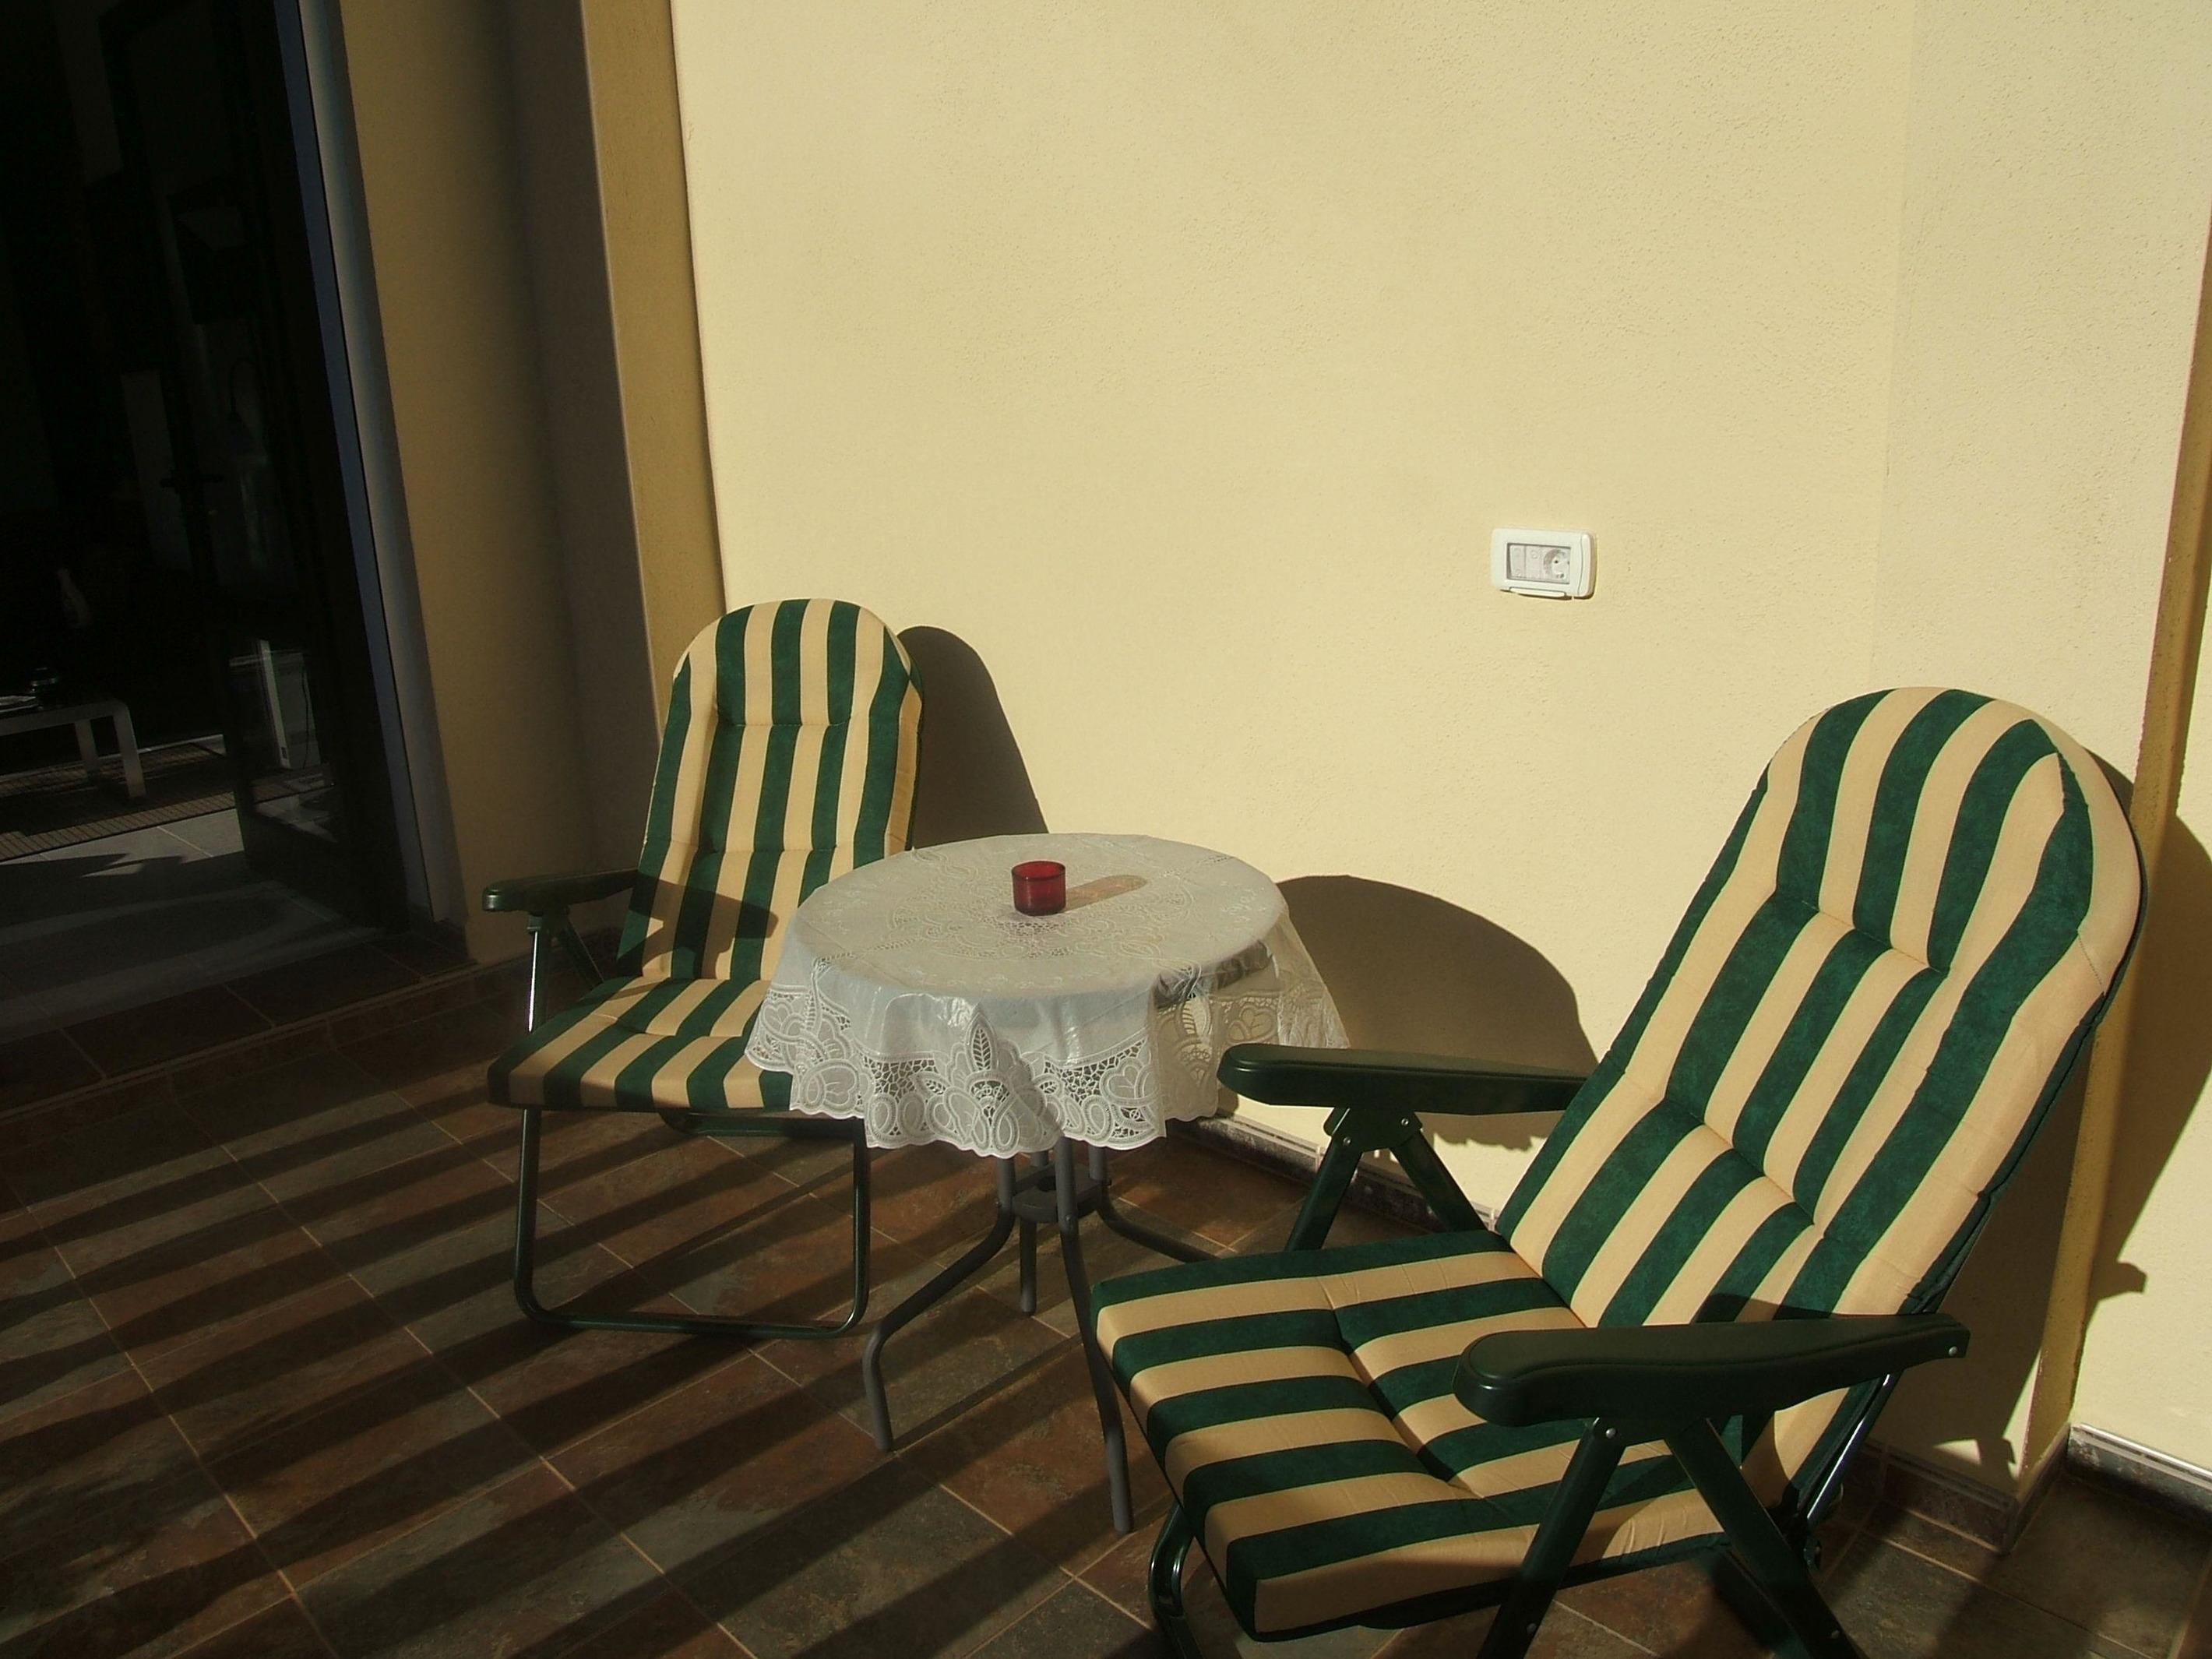 Appartement de vacances Fewo Strelitzia, im Grünen, am kleinen See, direkt am Strelitziengarten, mit Pool, Grill,  (2492987), Santa Ursula, Ténérife, Iles Canaries, Espagne, image 15